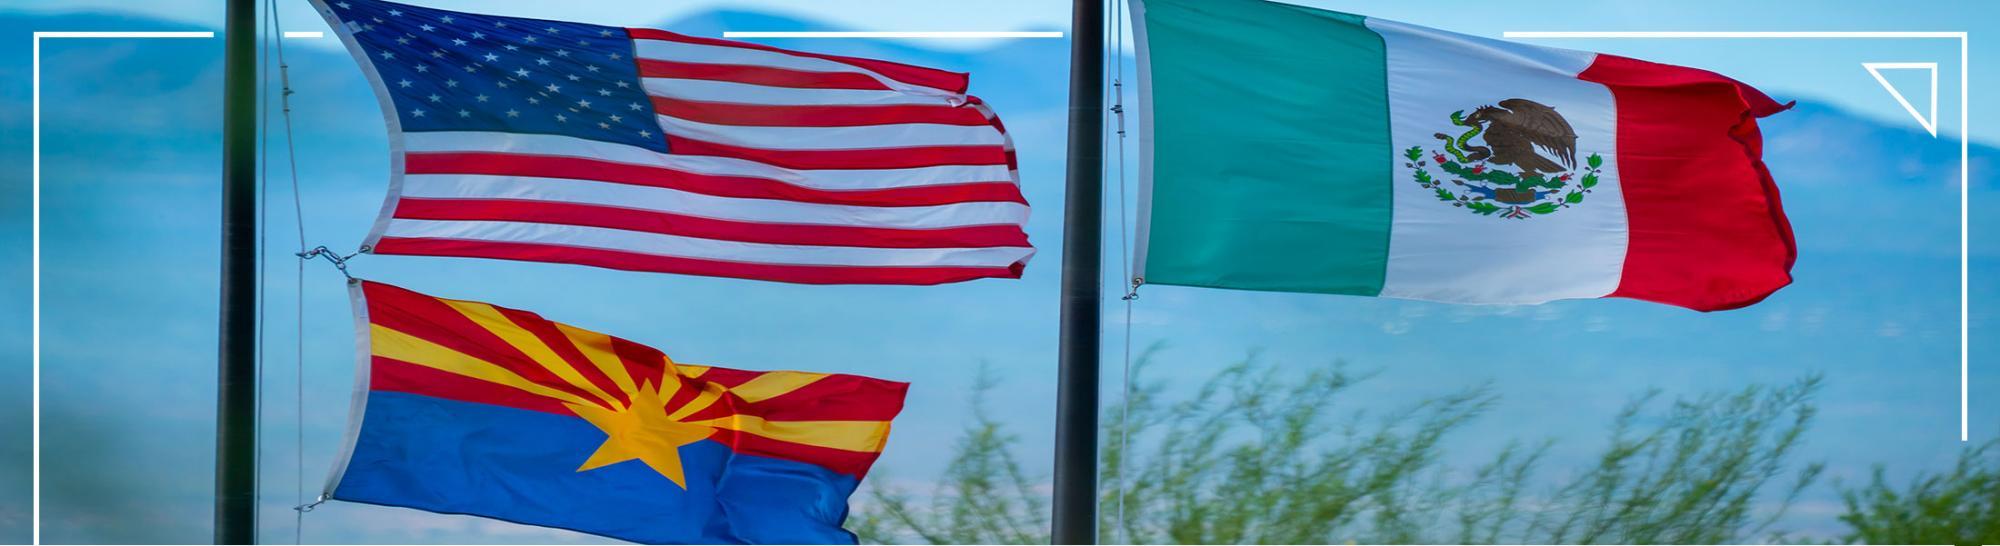 about arizona-mexico economic indicators project